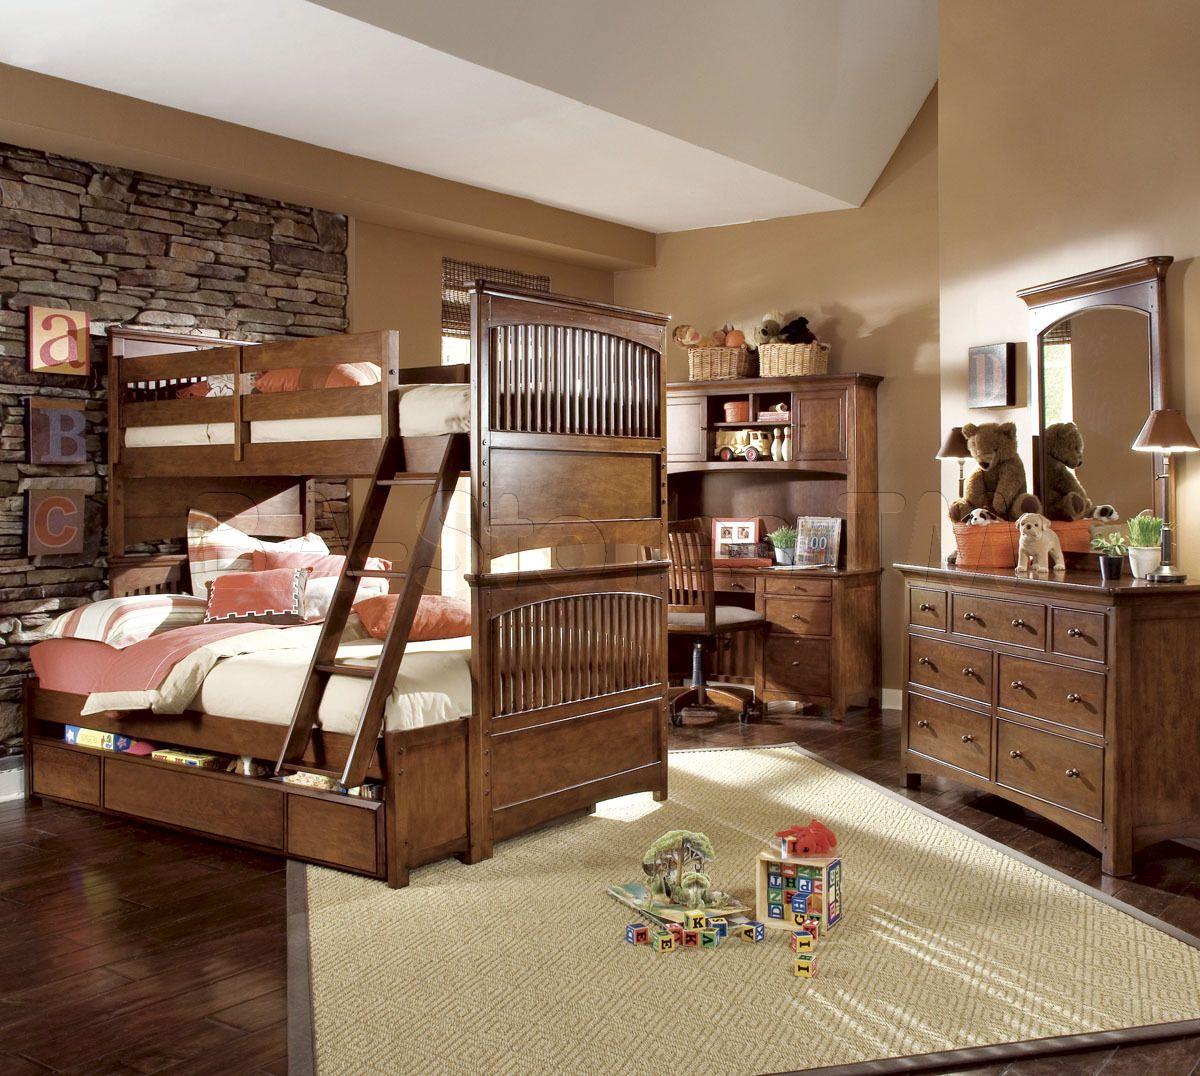 Lea Bedroom Furniture Lea Elite Crossover 5 Pc Bedroom Set Bunk Bed Dresser Mirror